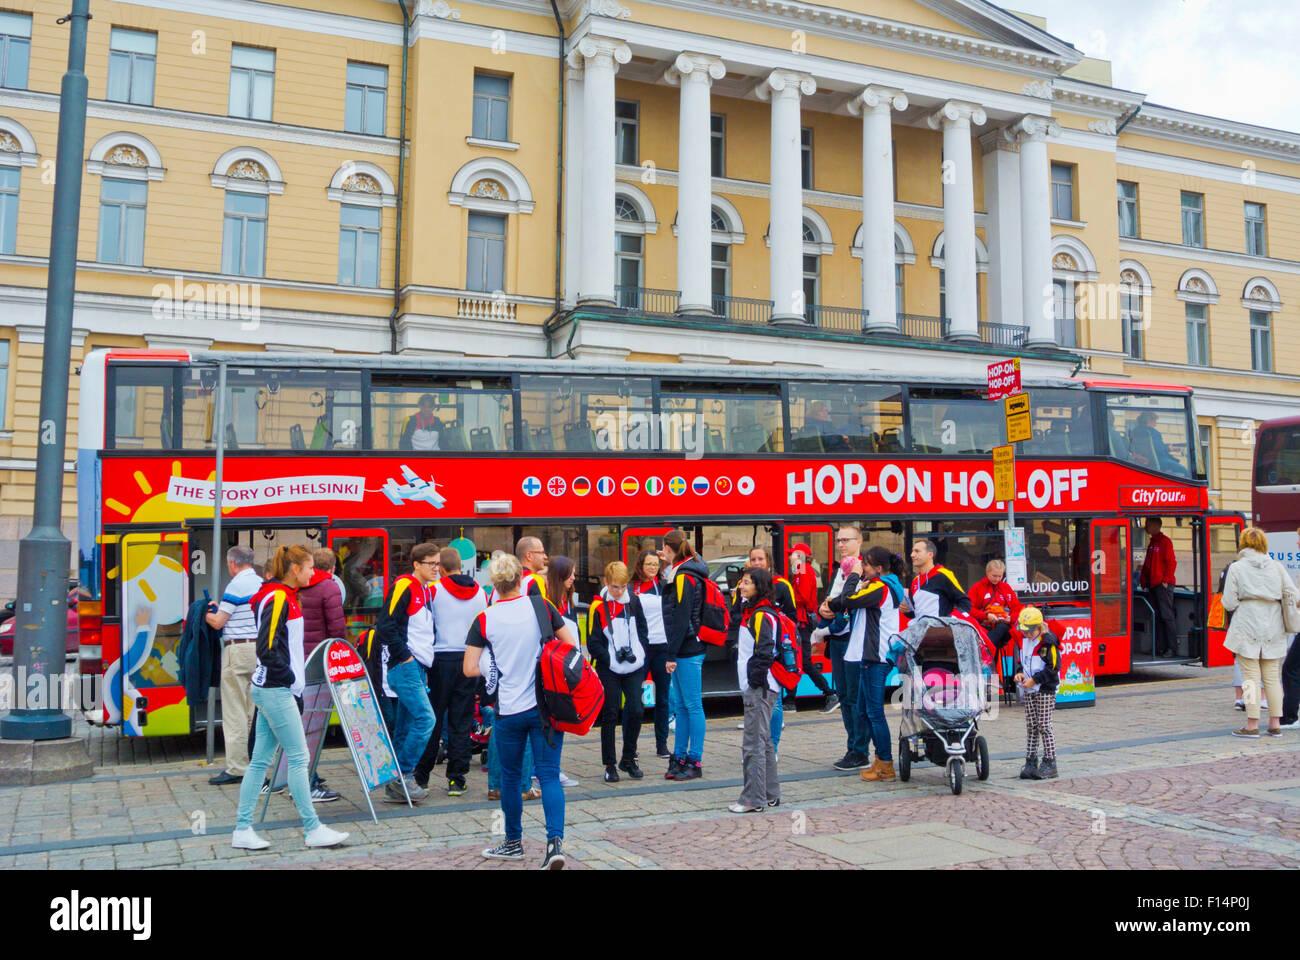 CityTour bus, Senaatintori, Helsinki, Finland, Europe - Stock Image